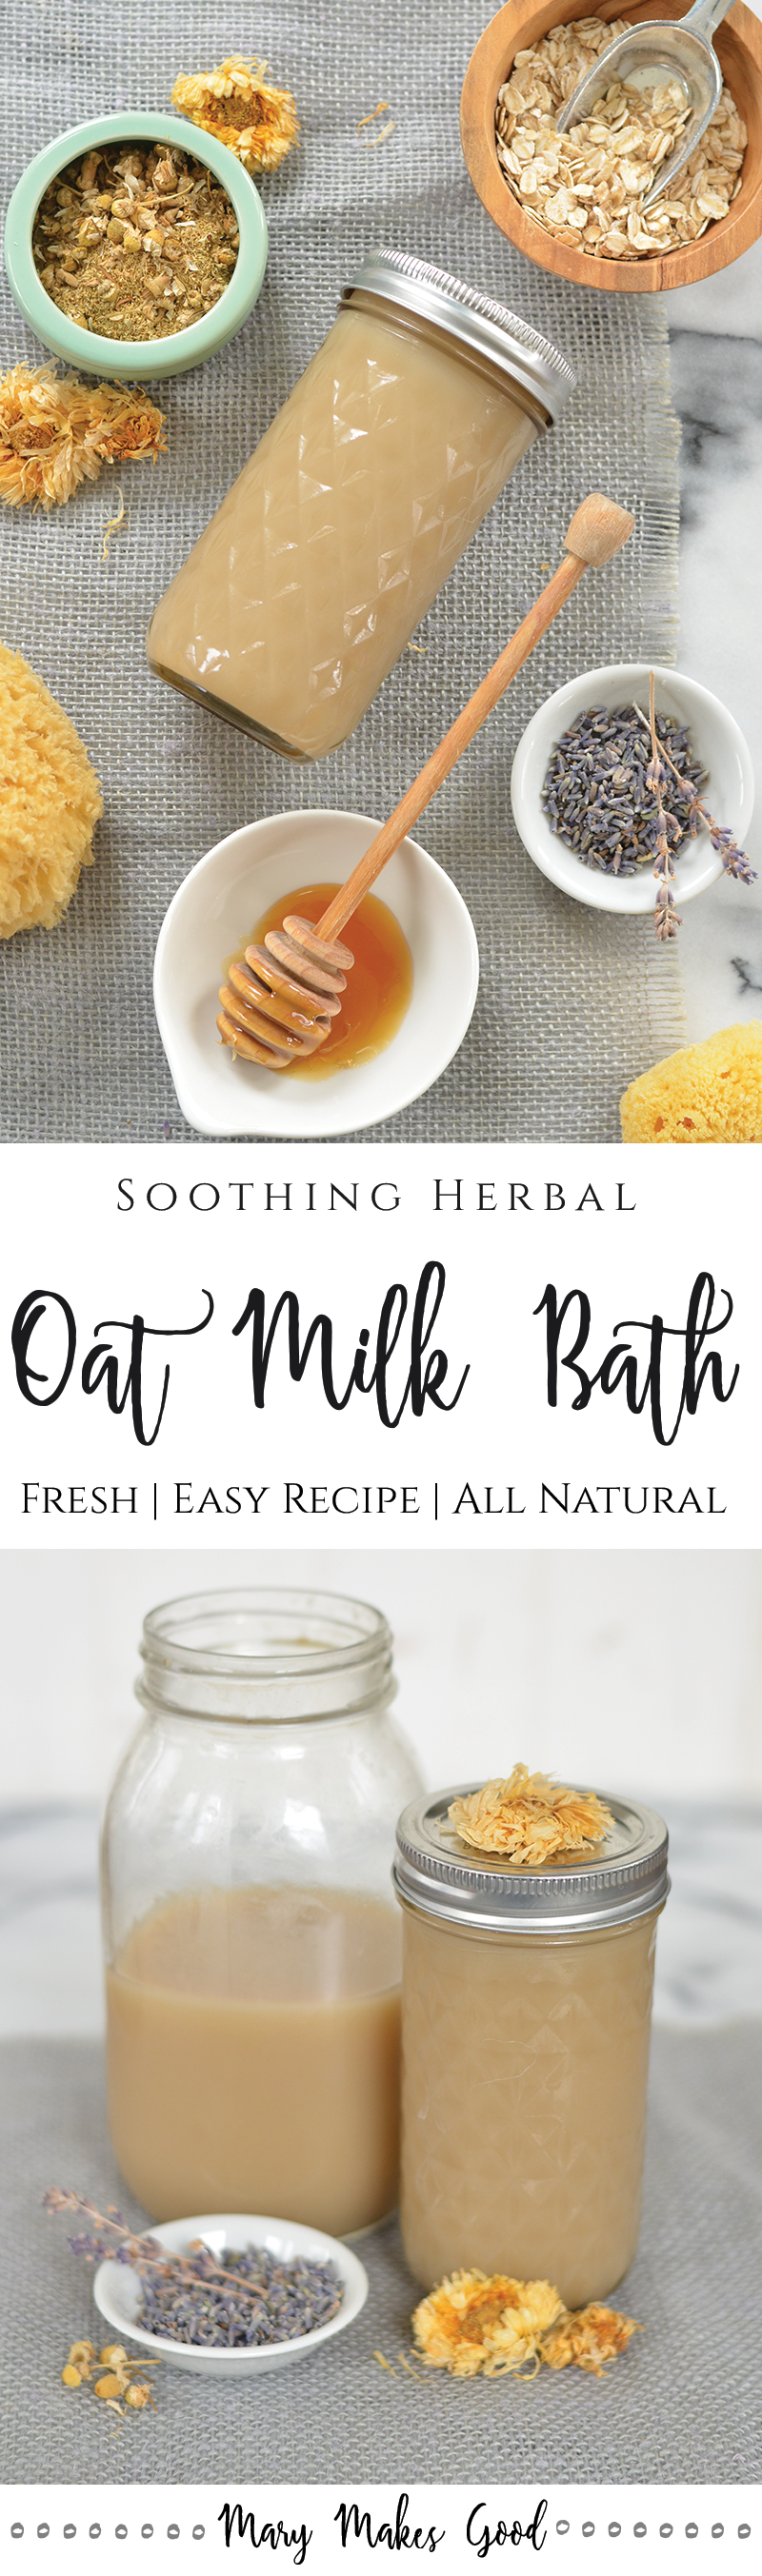 Herbal Oat Milk Bath